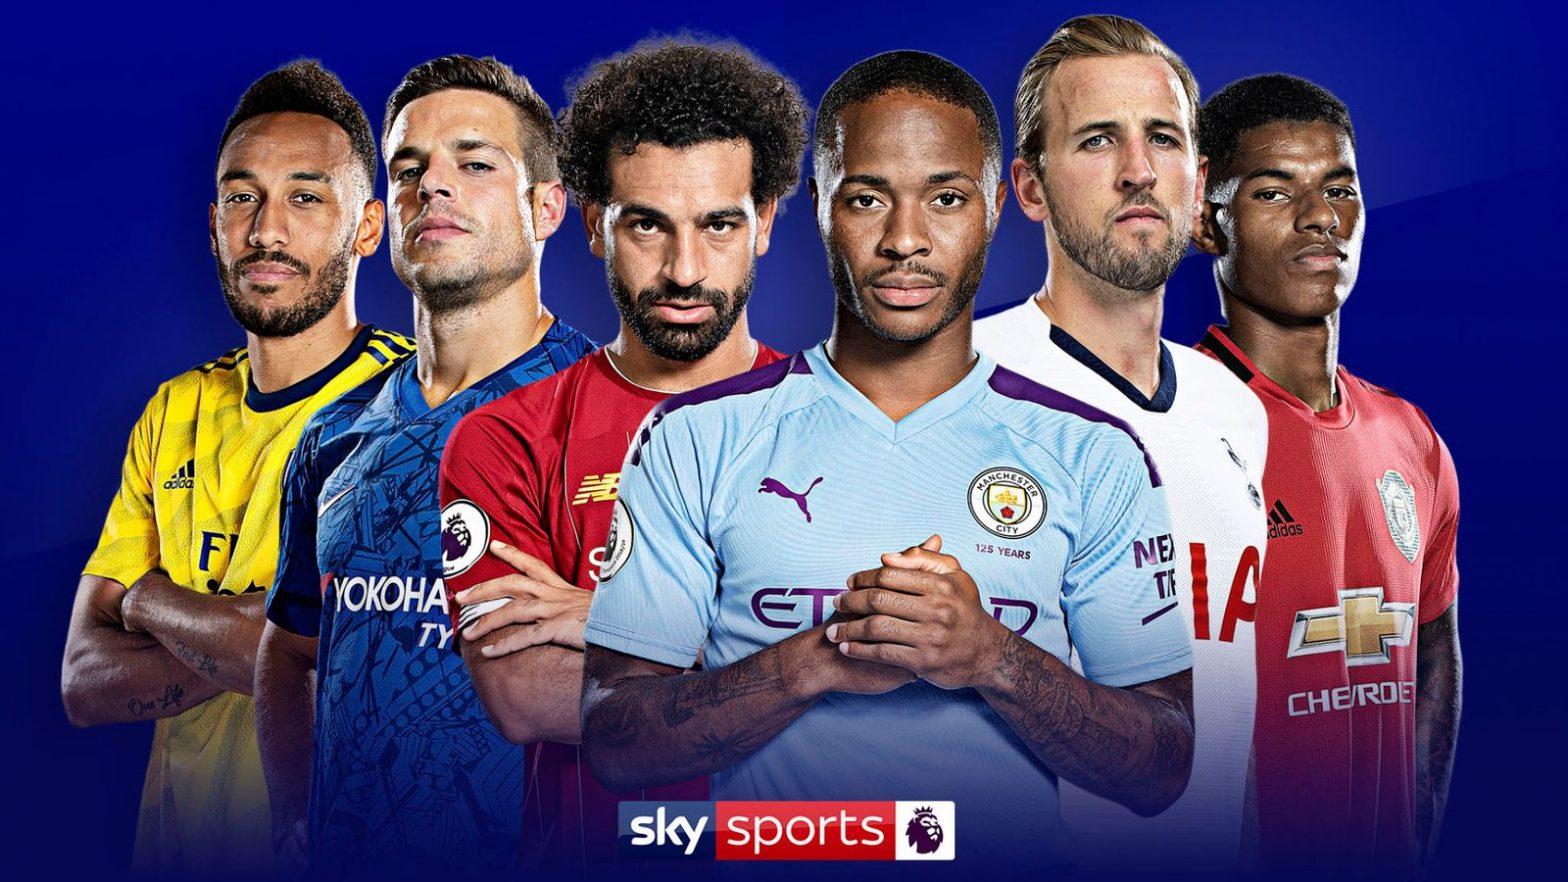 Manchester derby live on Sky in December